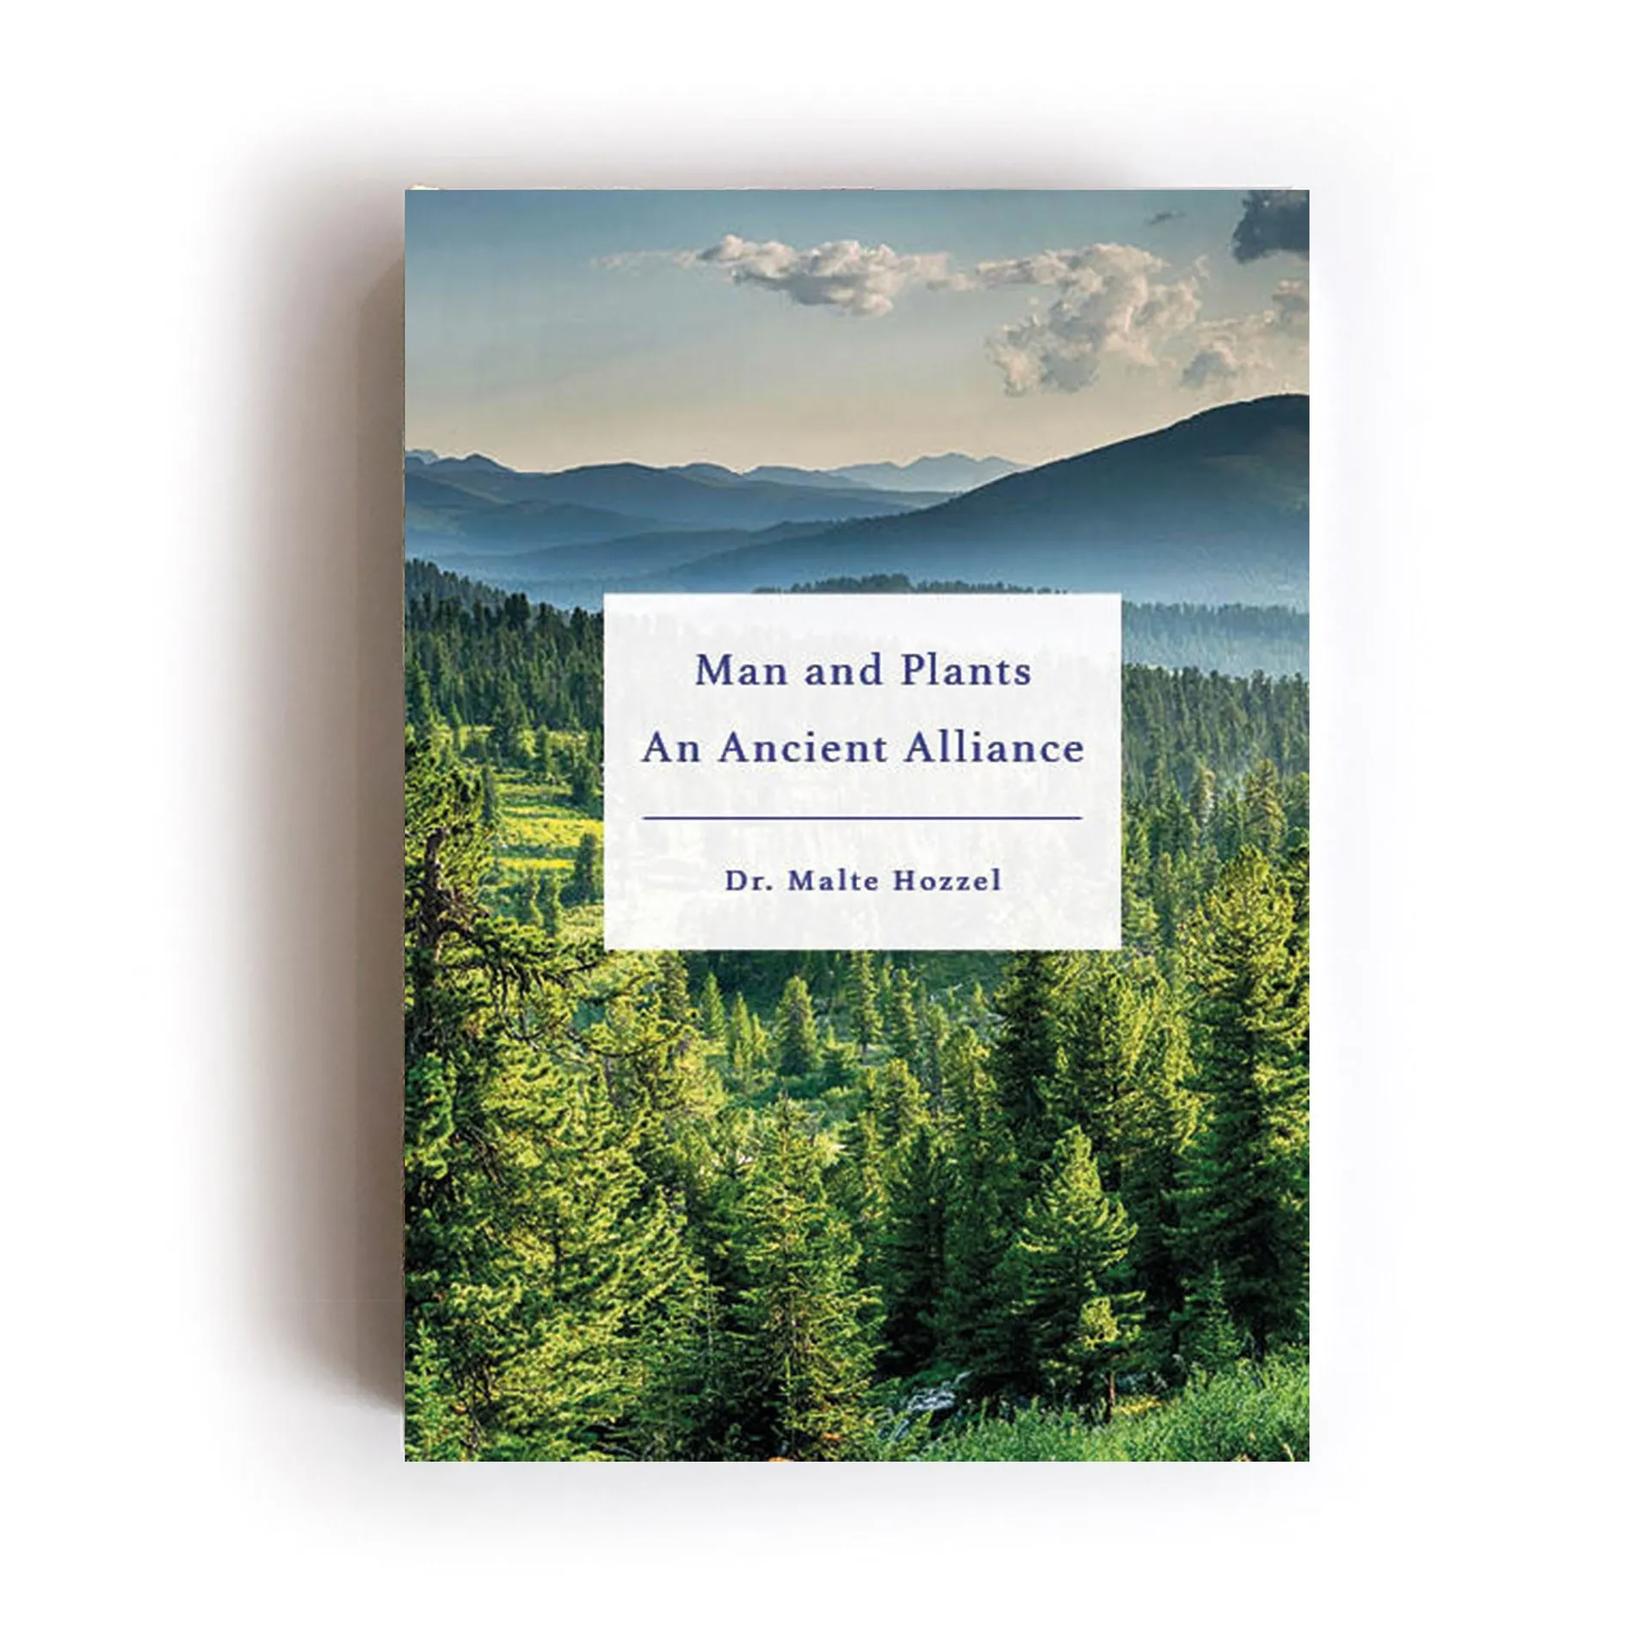 Oshadhi Boek - Man and plants, an ancient alliance - Dr. Malte Hozzel